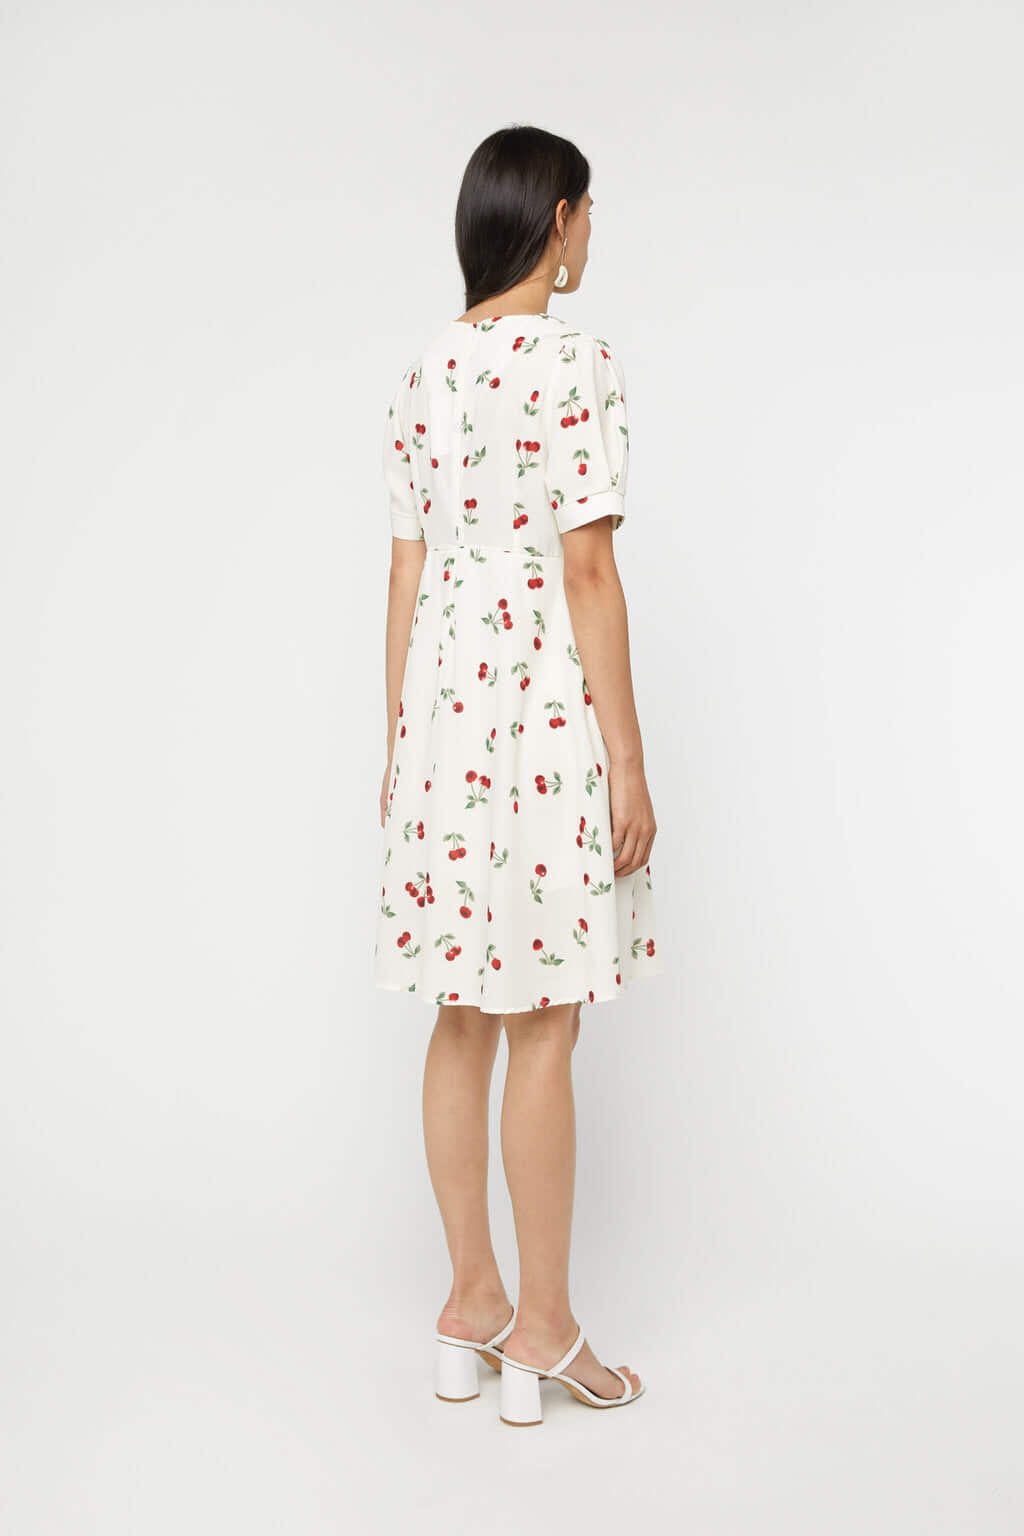 Dress K018 Cream 4